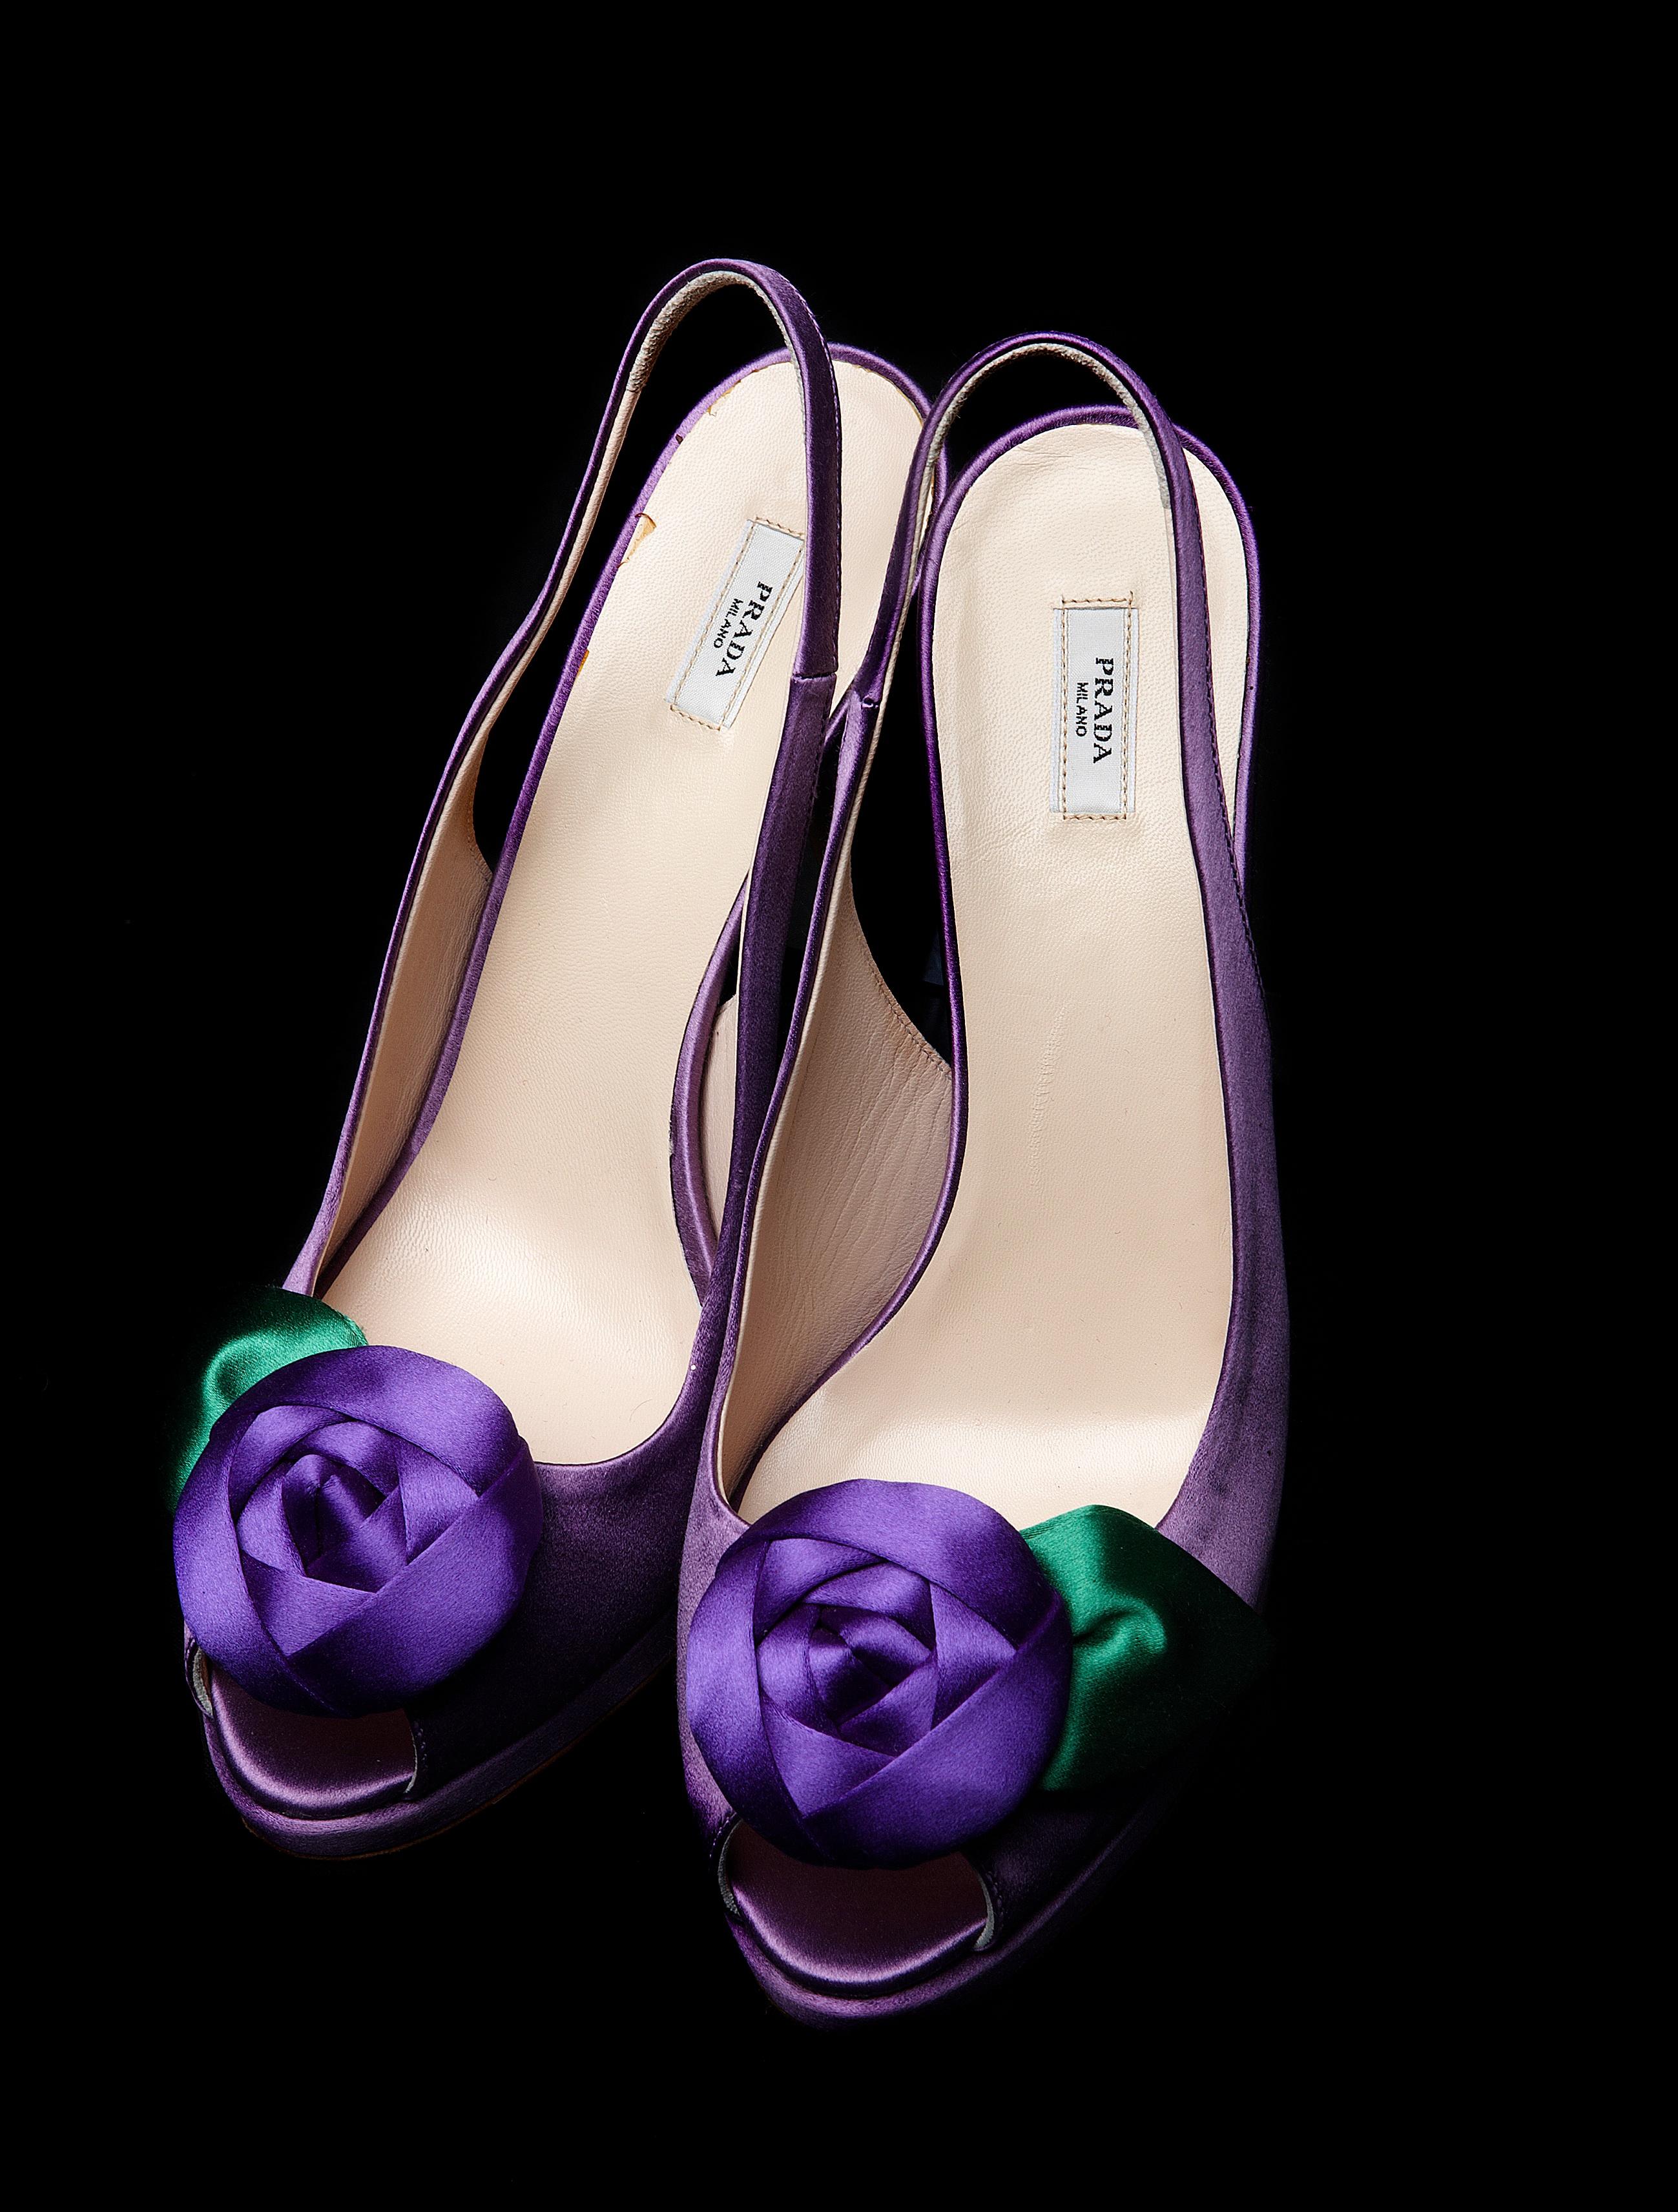 Prada sandals, 280 ευρώ